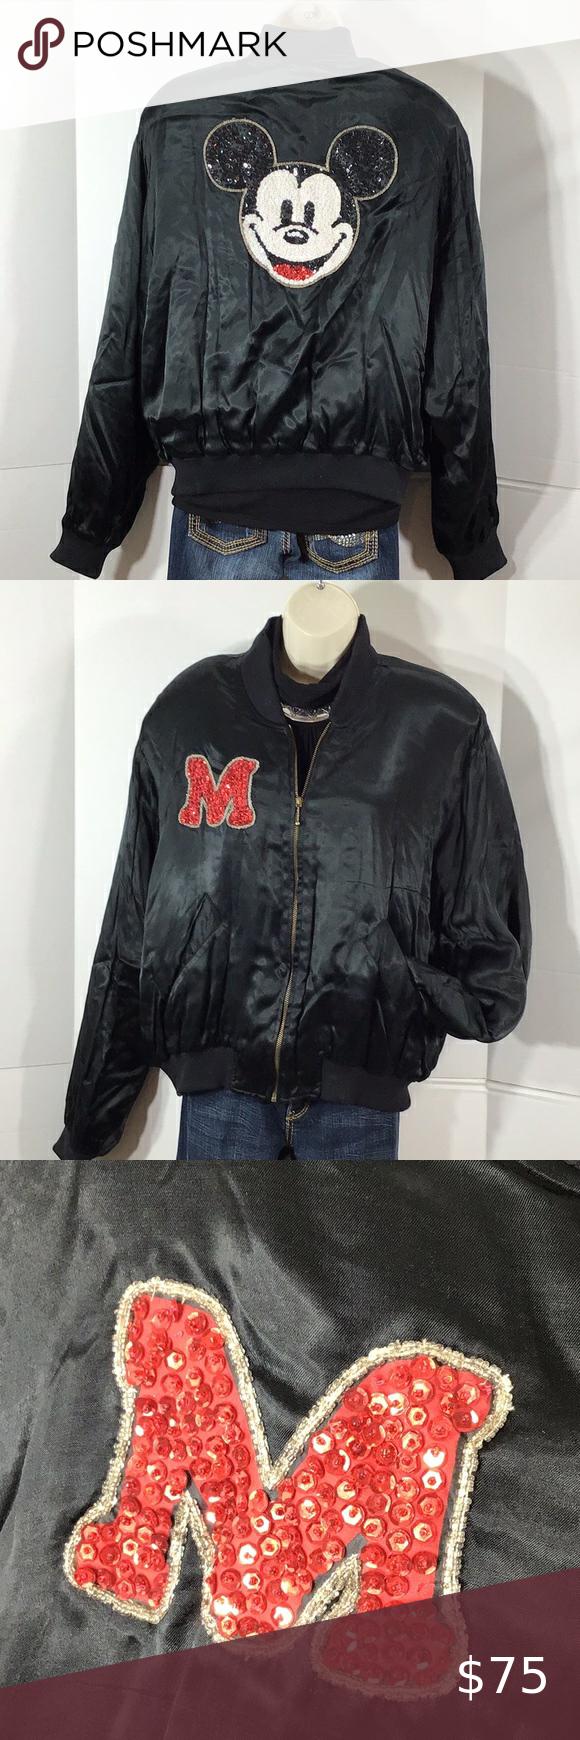 Disney Joujou Satin Mickey Mouse Bomber Jacket Bomber Jacket Black Bomber Jacket Clothes Design [ 1740 x 580 Pixel ]